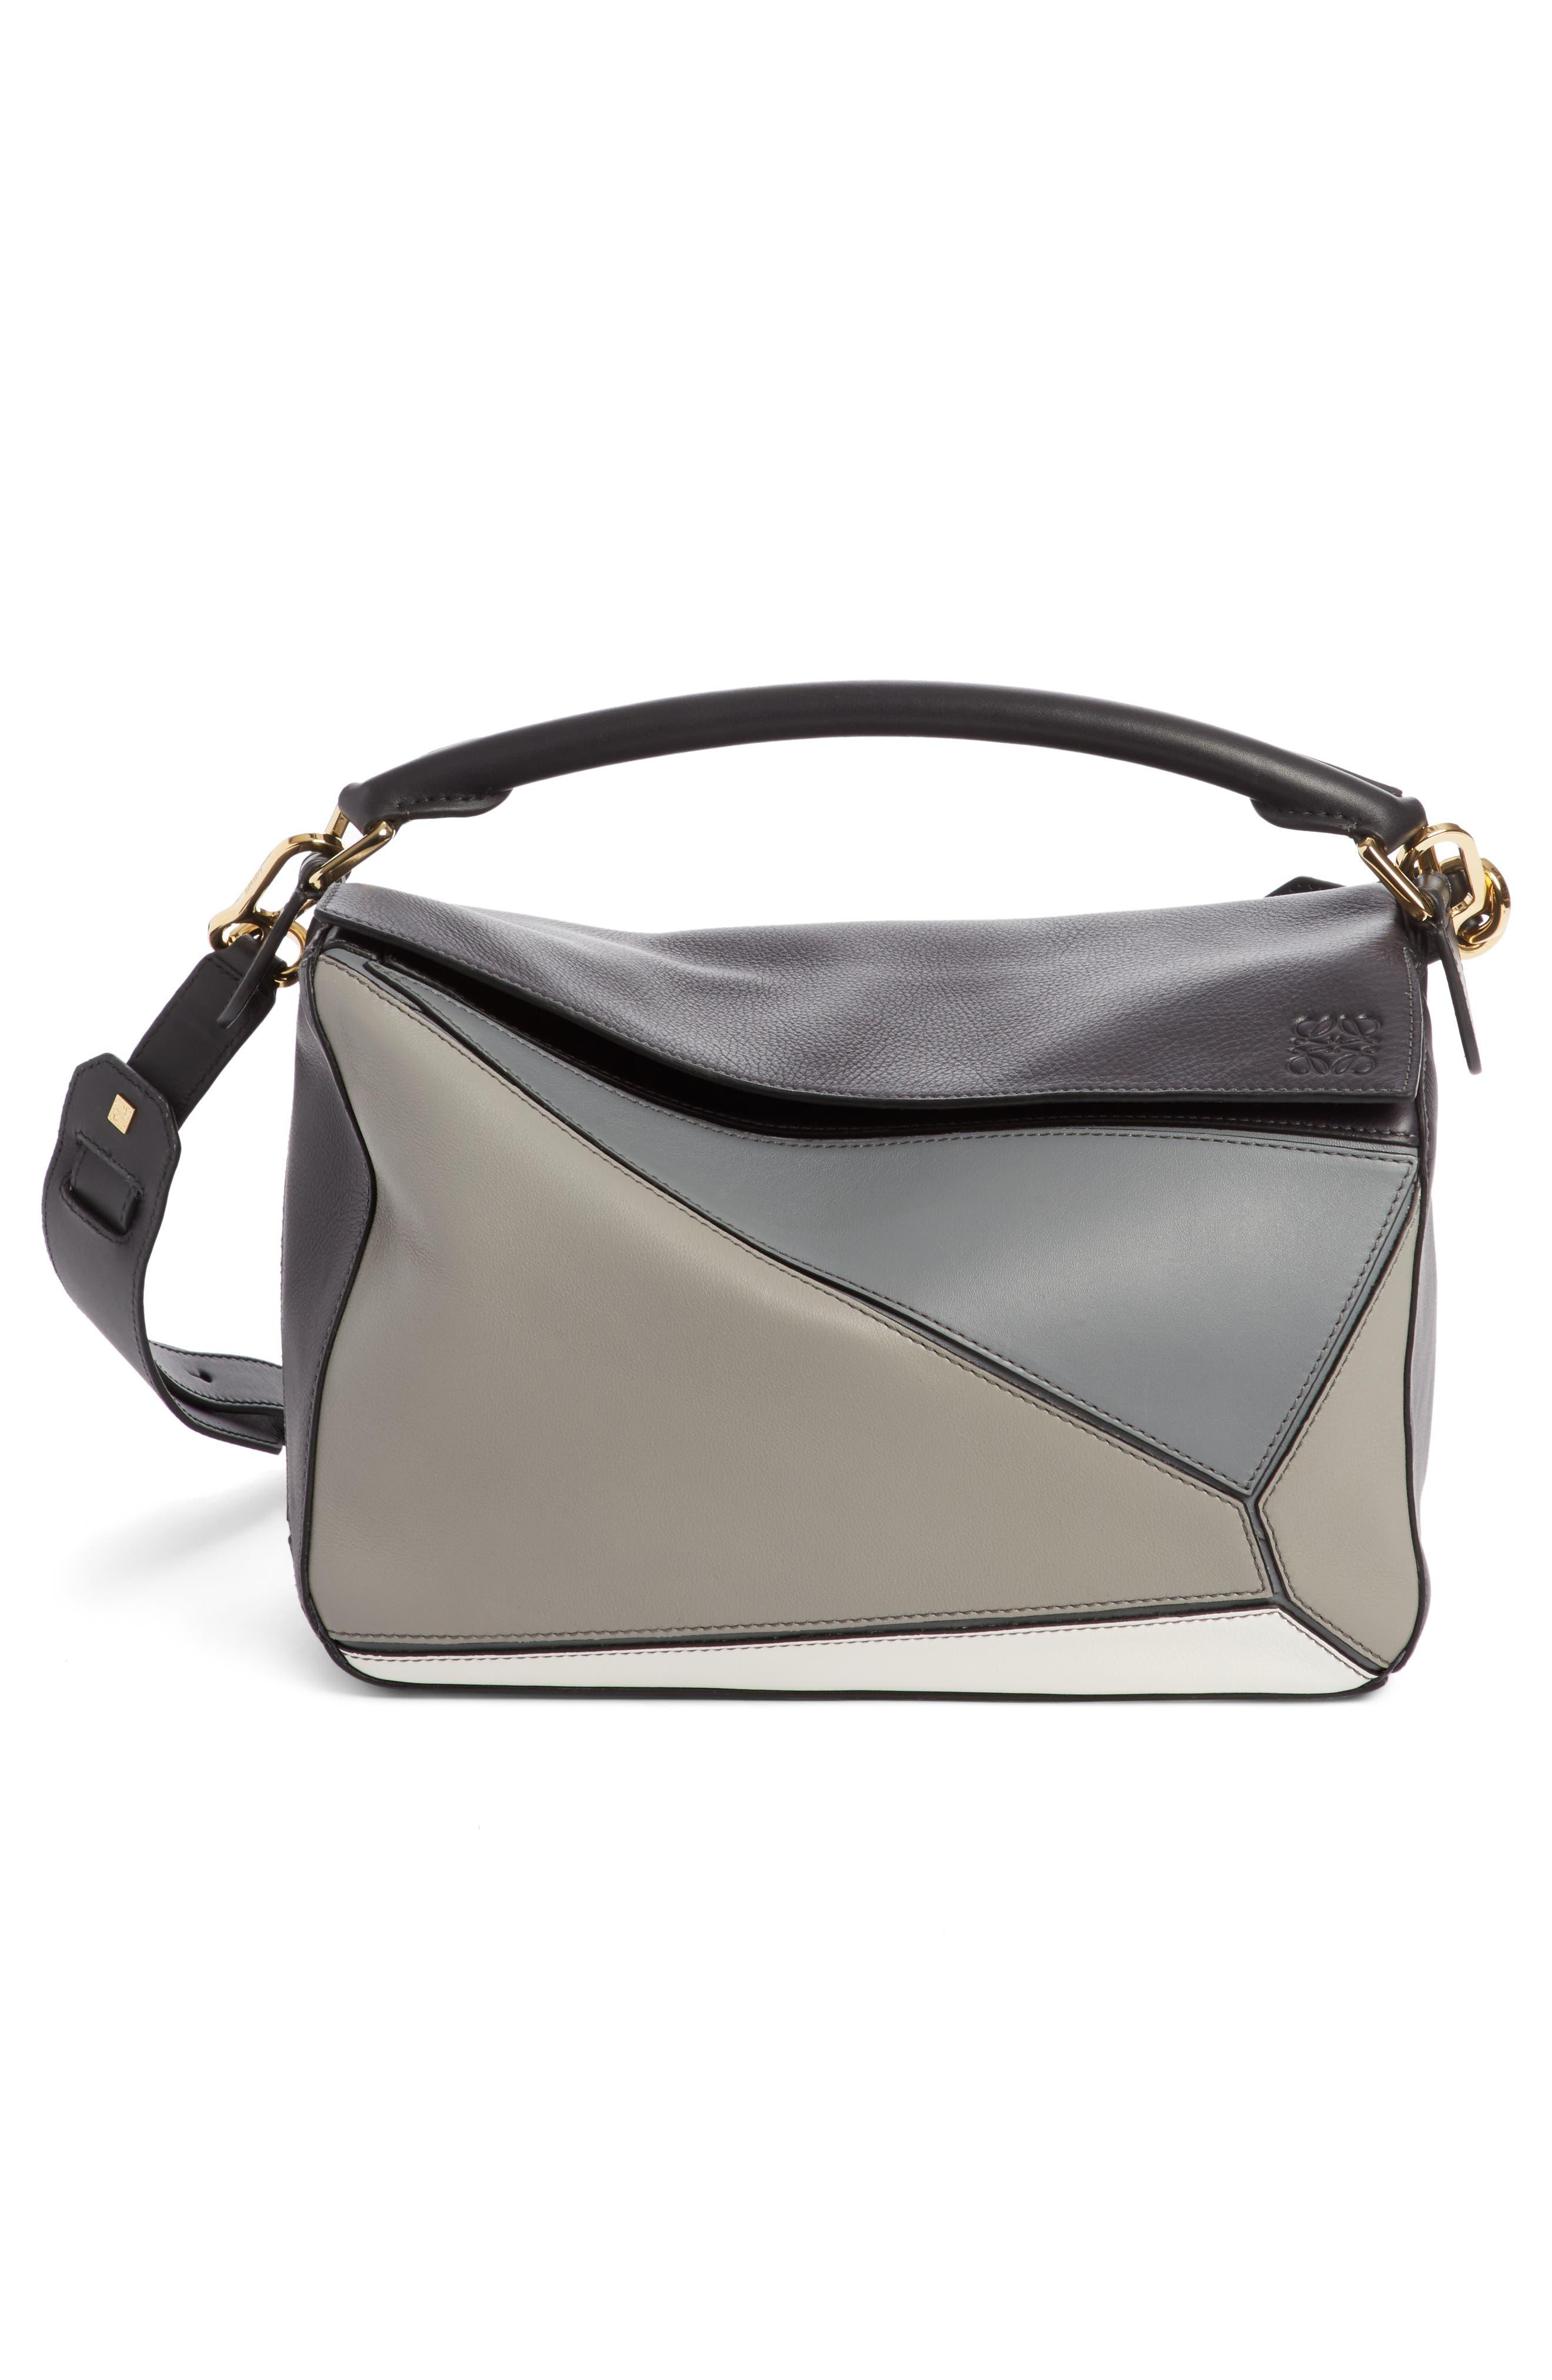 Medium Puzzle Colorblock Leather Shoulder Bag,                         Main,                         color, Grey Multi Tone